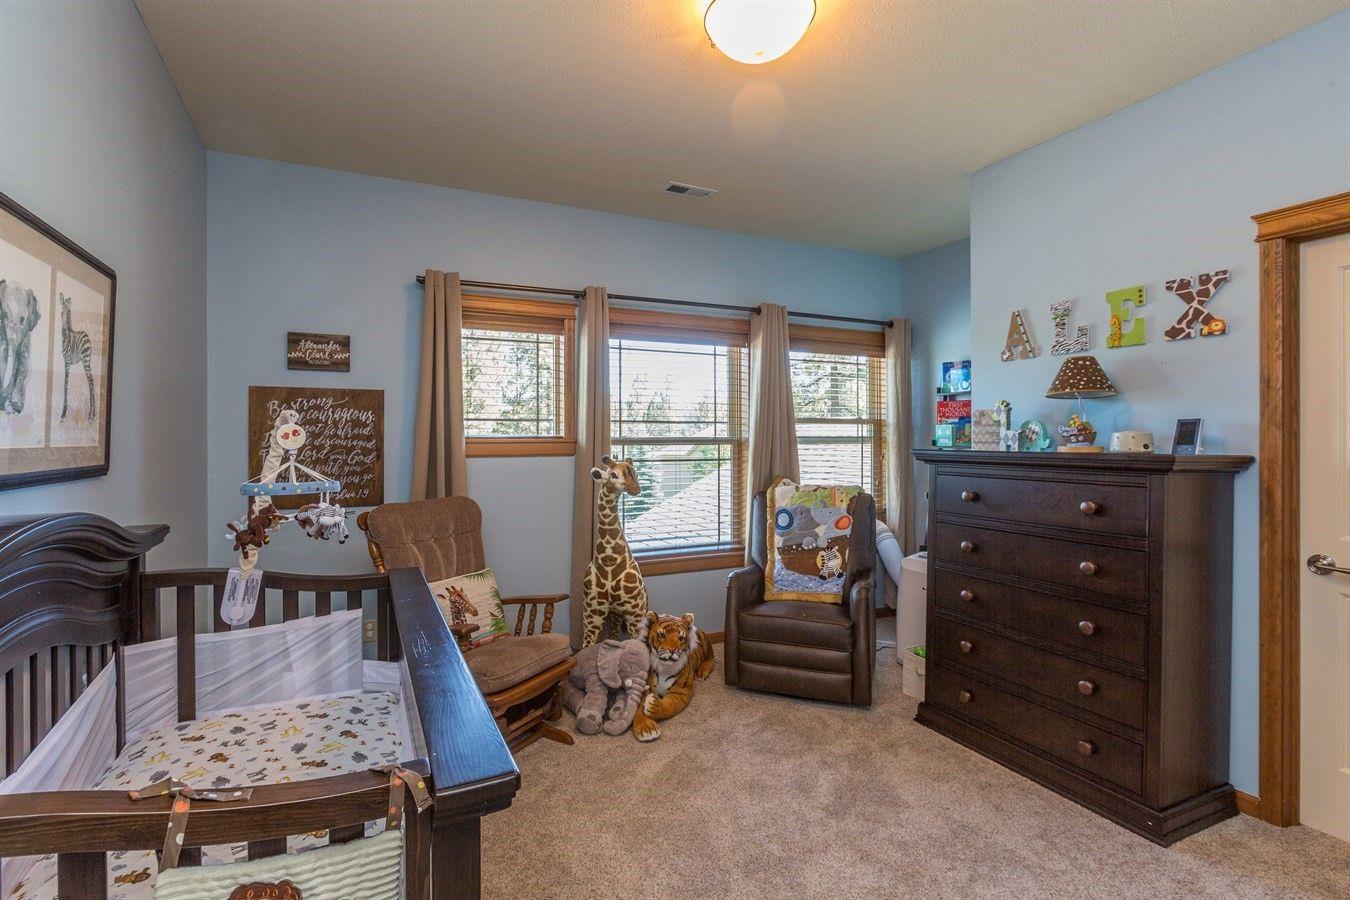 Fairway Ridge, Spokane, WA 99224 | Home decor, House, Home